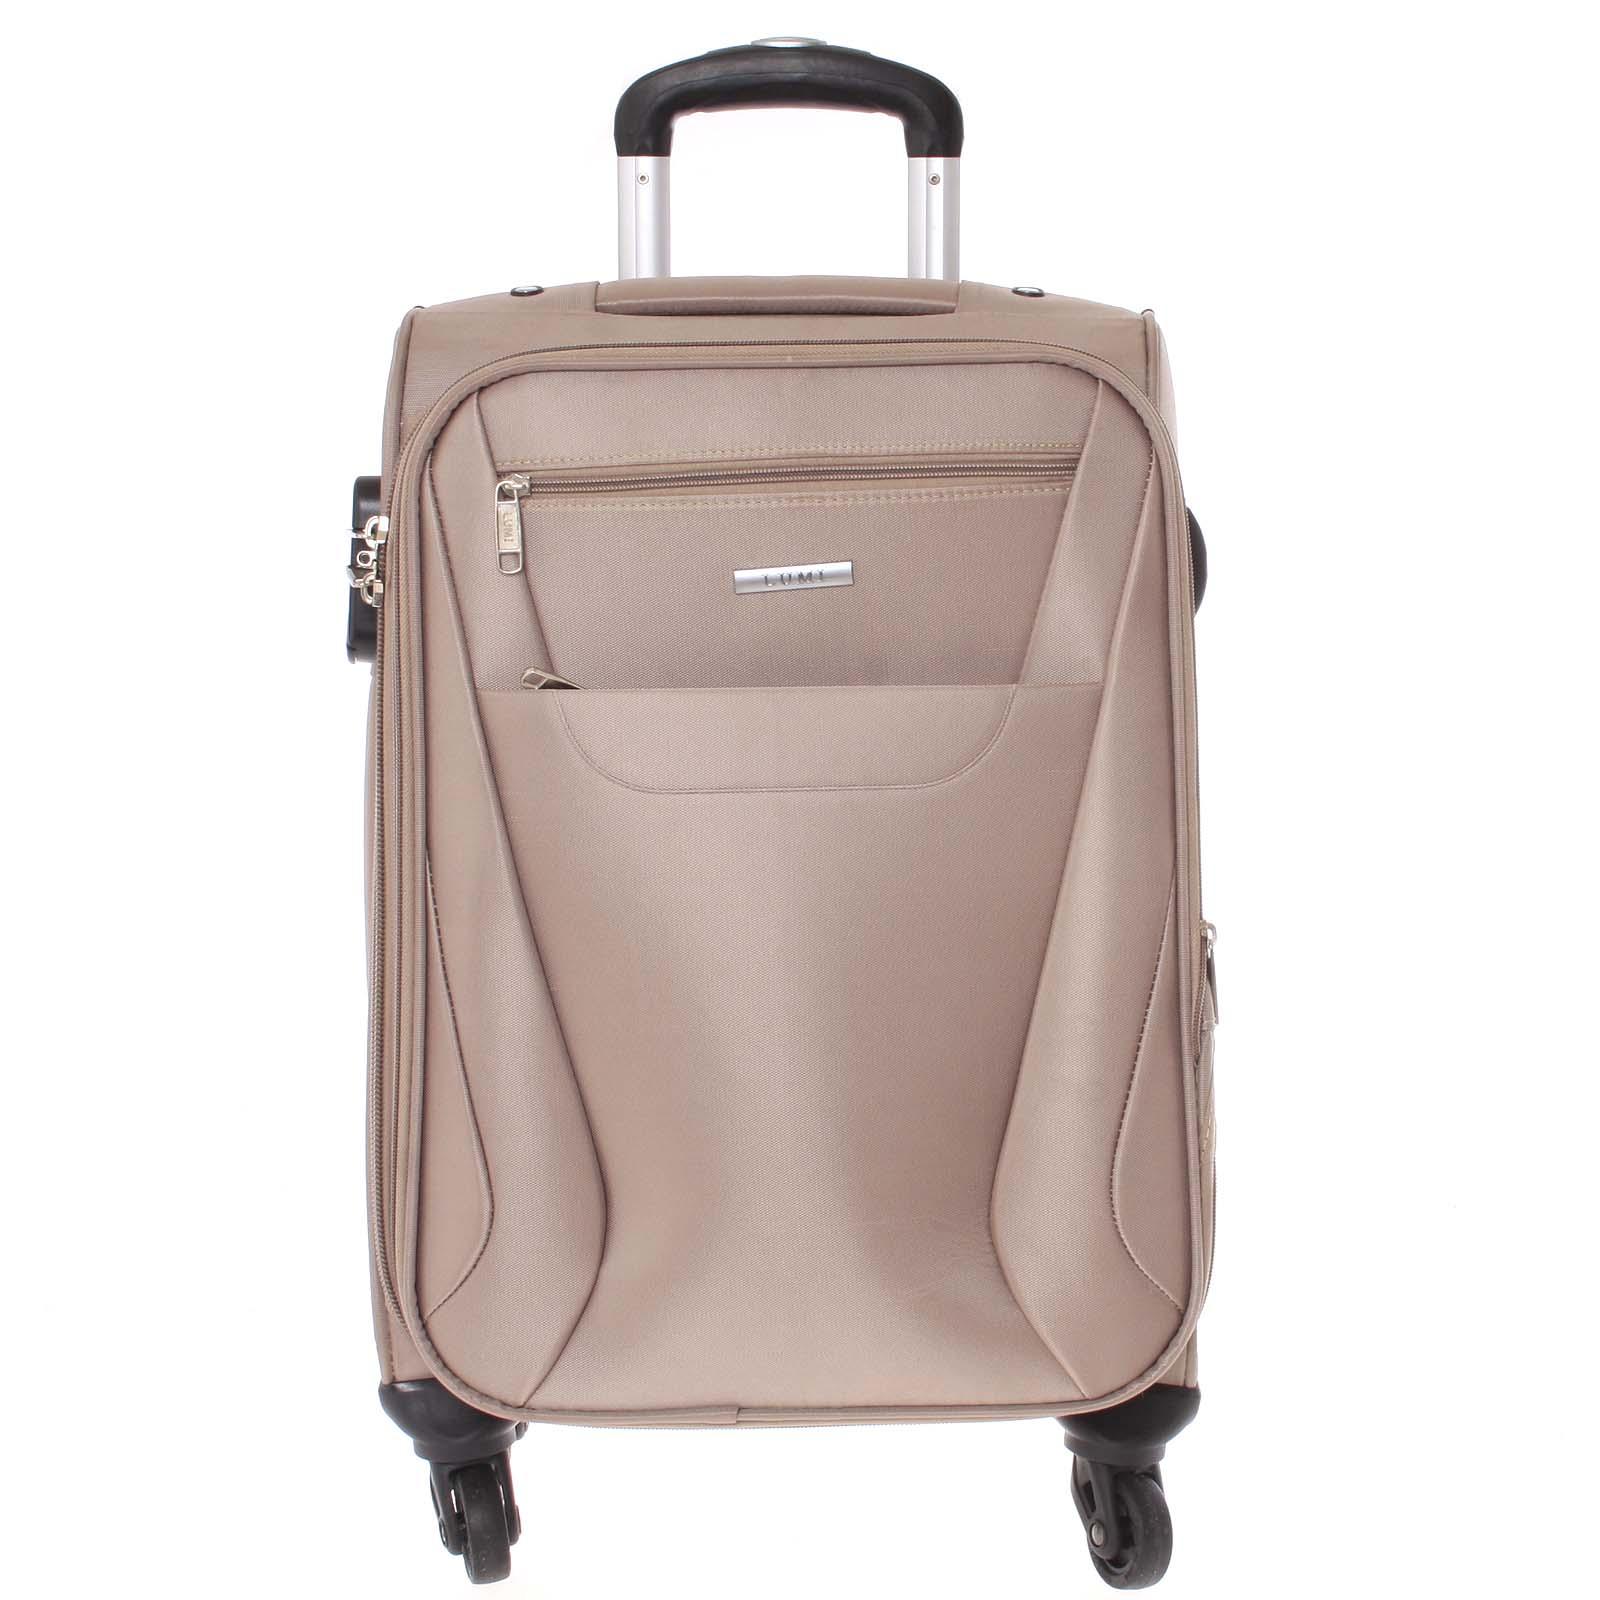 Pevnější látkový kufr tmavý béžový - Lumi Iann M